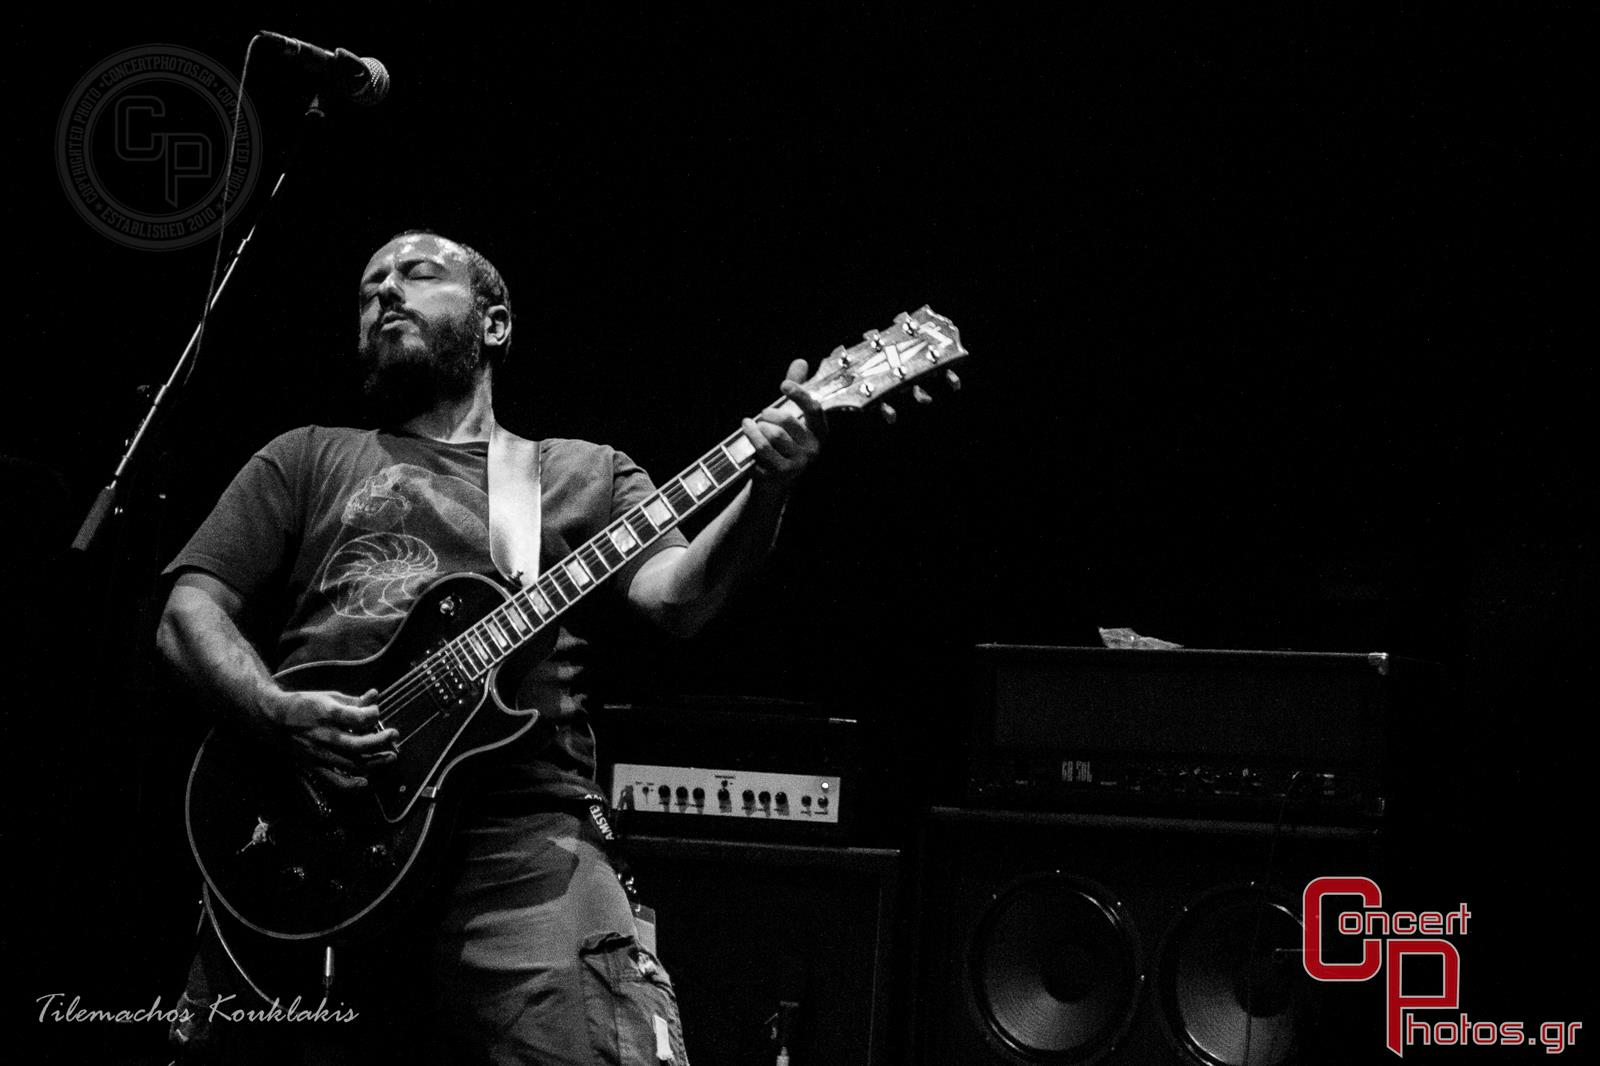 Neurosis-Neurosis photographer:  - concertphotos_20140707_23_56_48-7